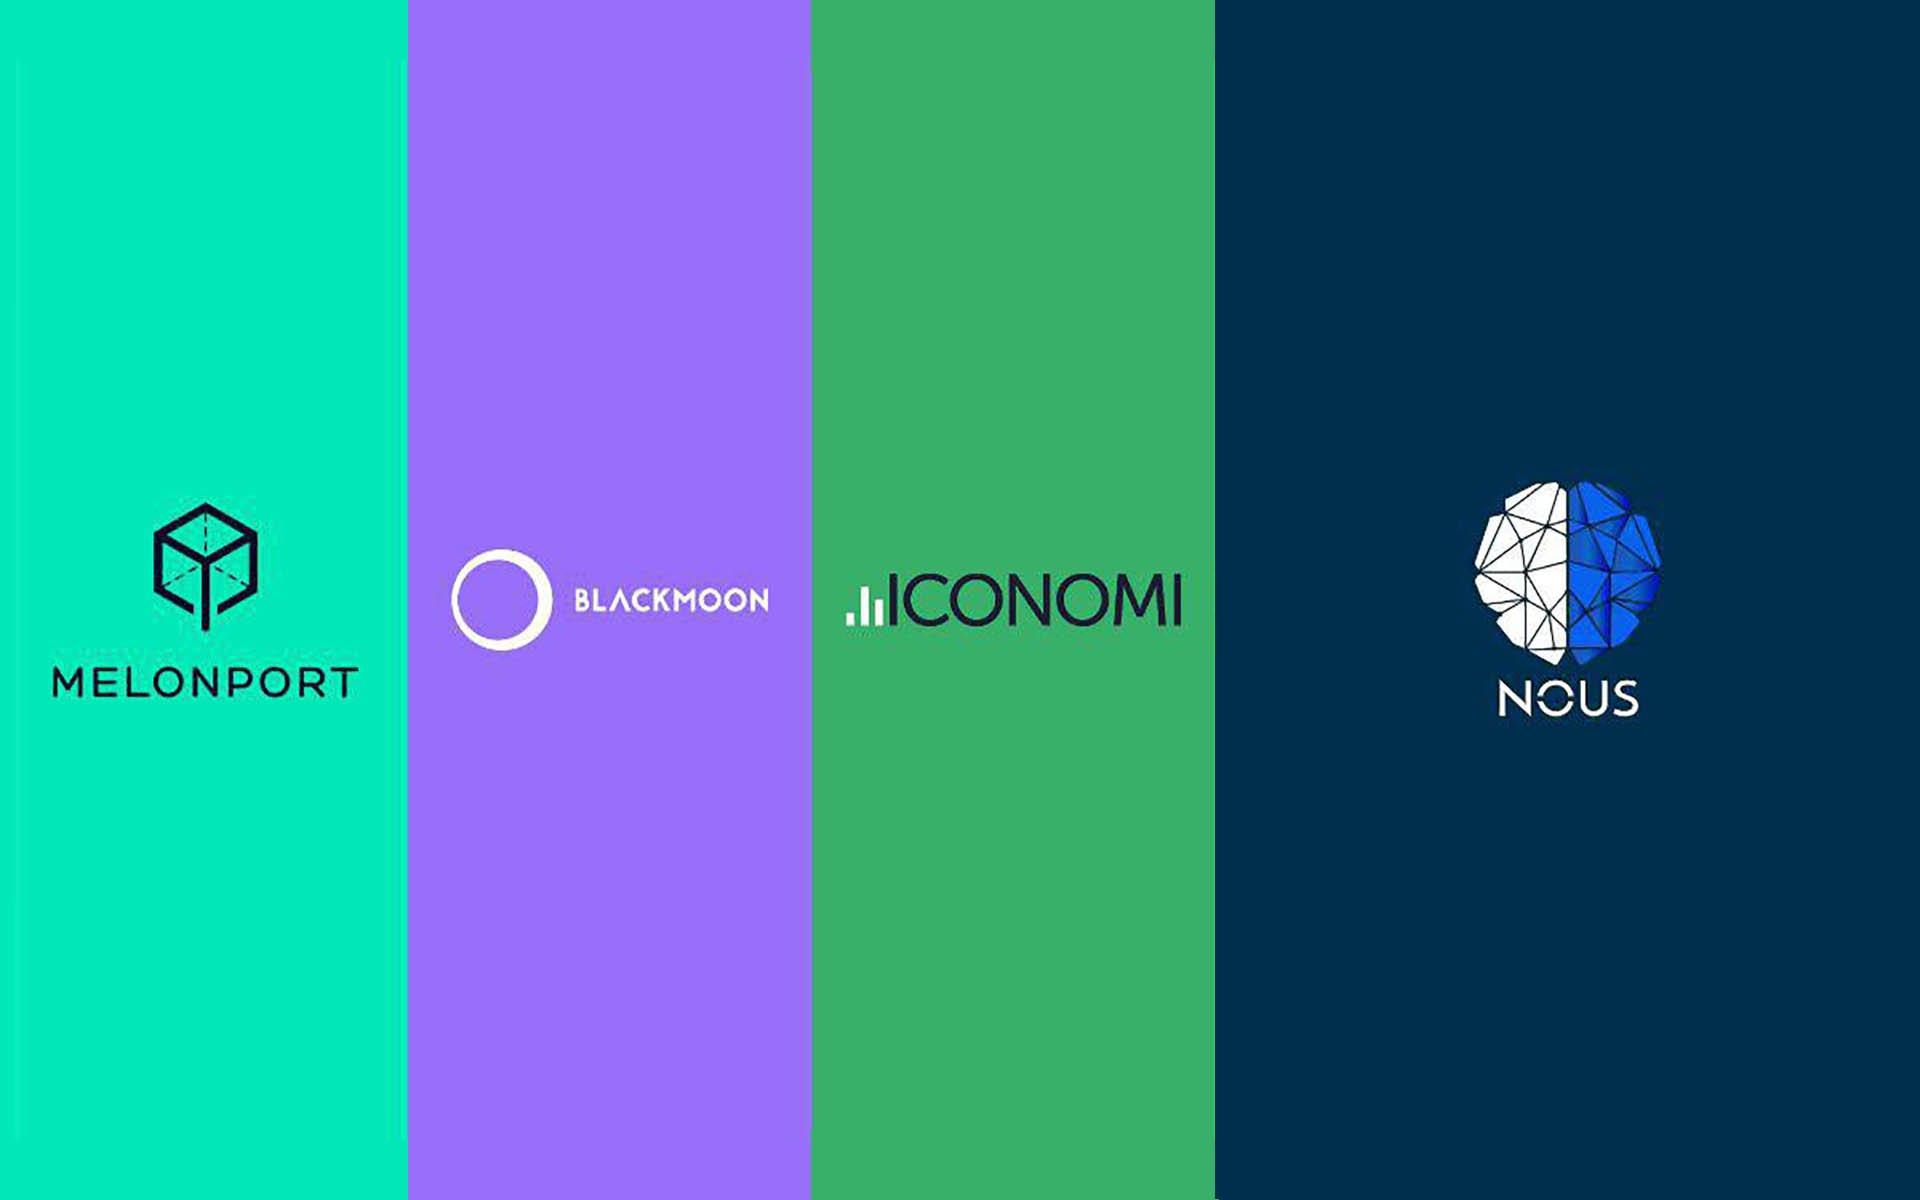 Blackmoon, Nousplatform, ICONOMI and Melonport: Revolutionaries of Traditional Investment